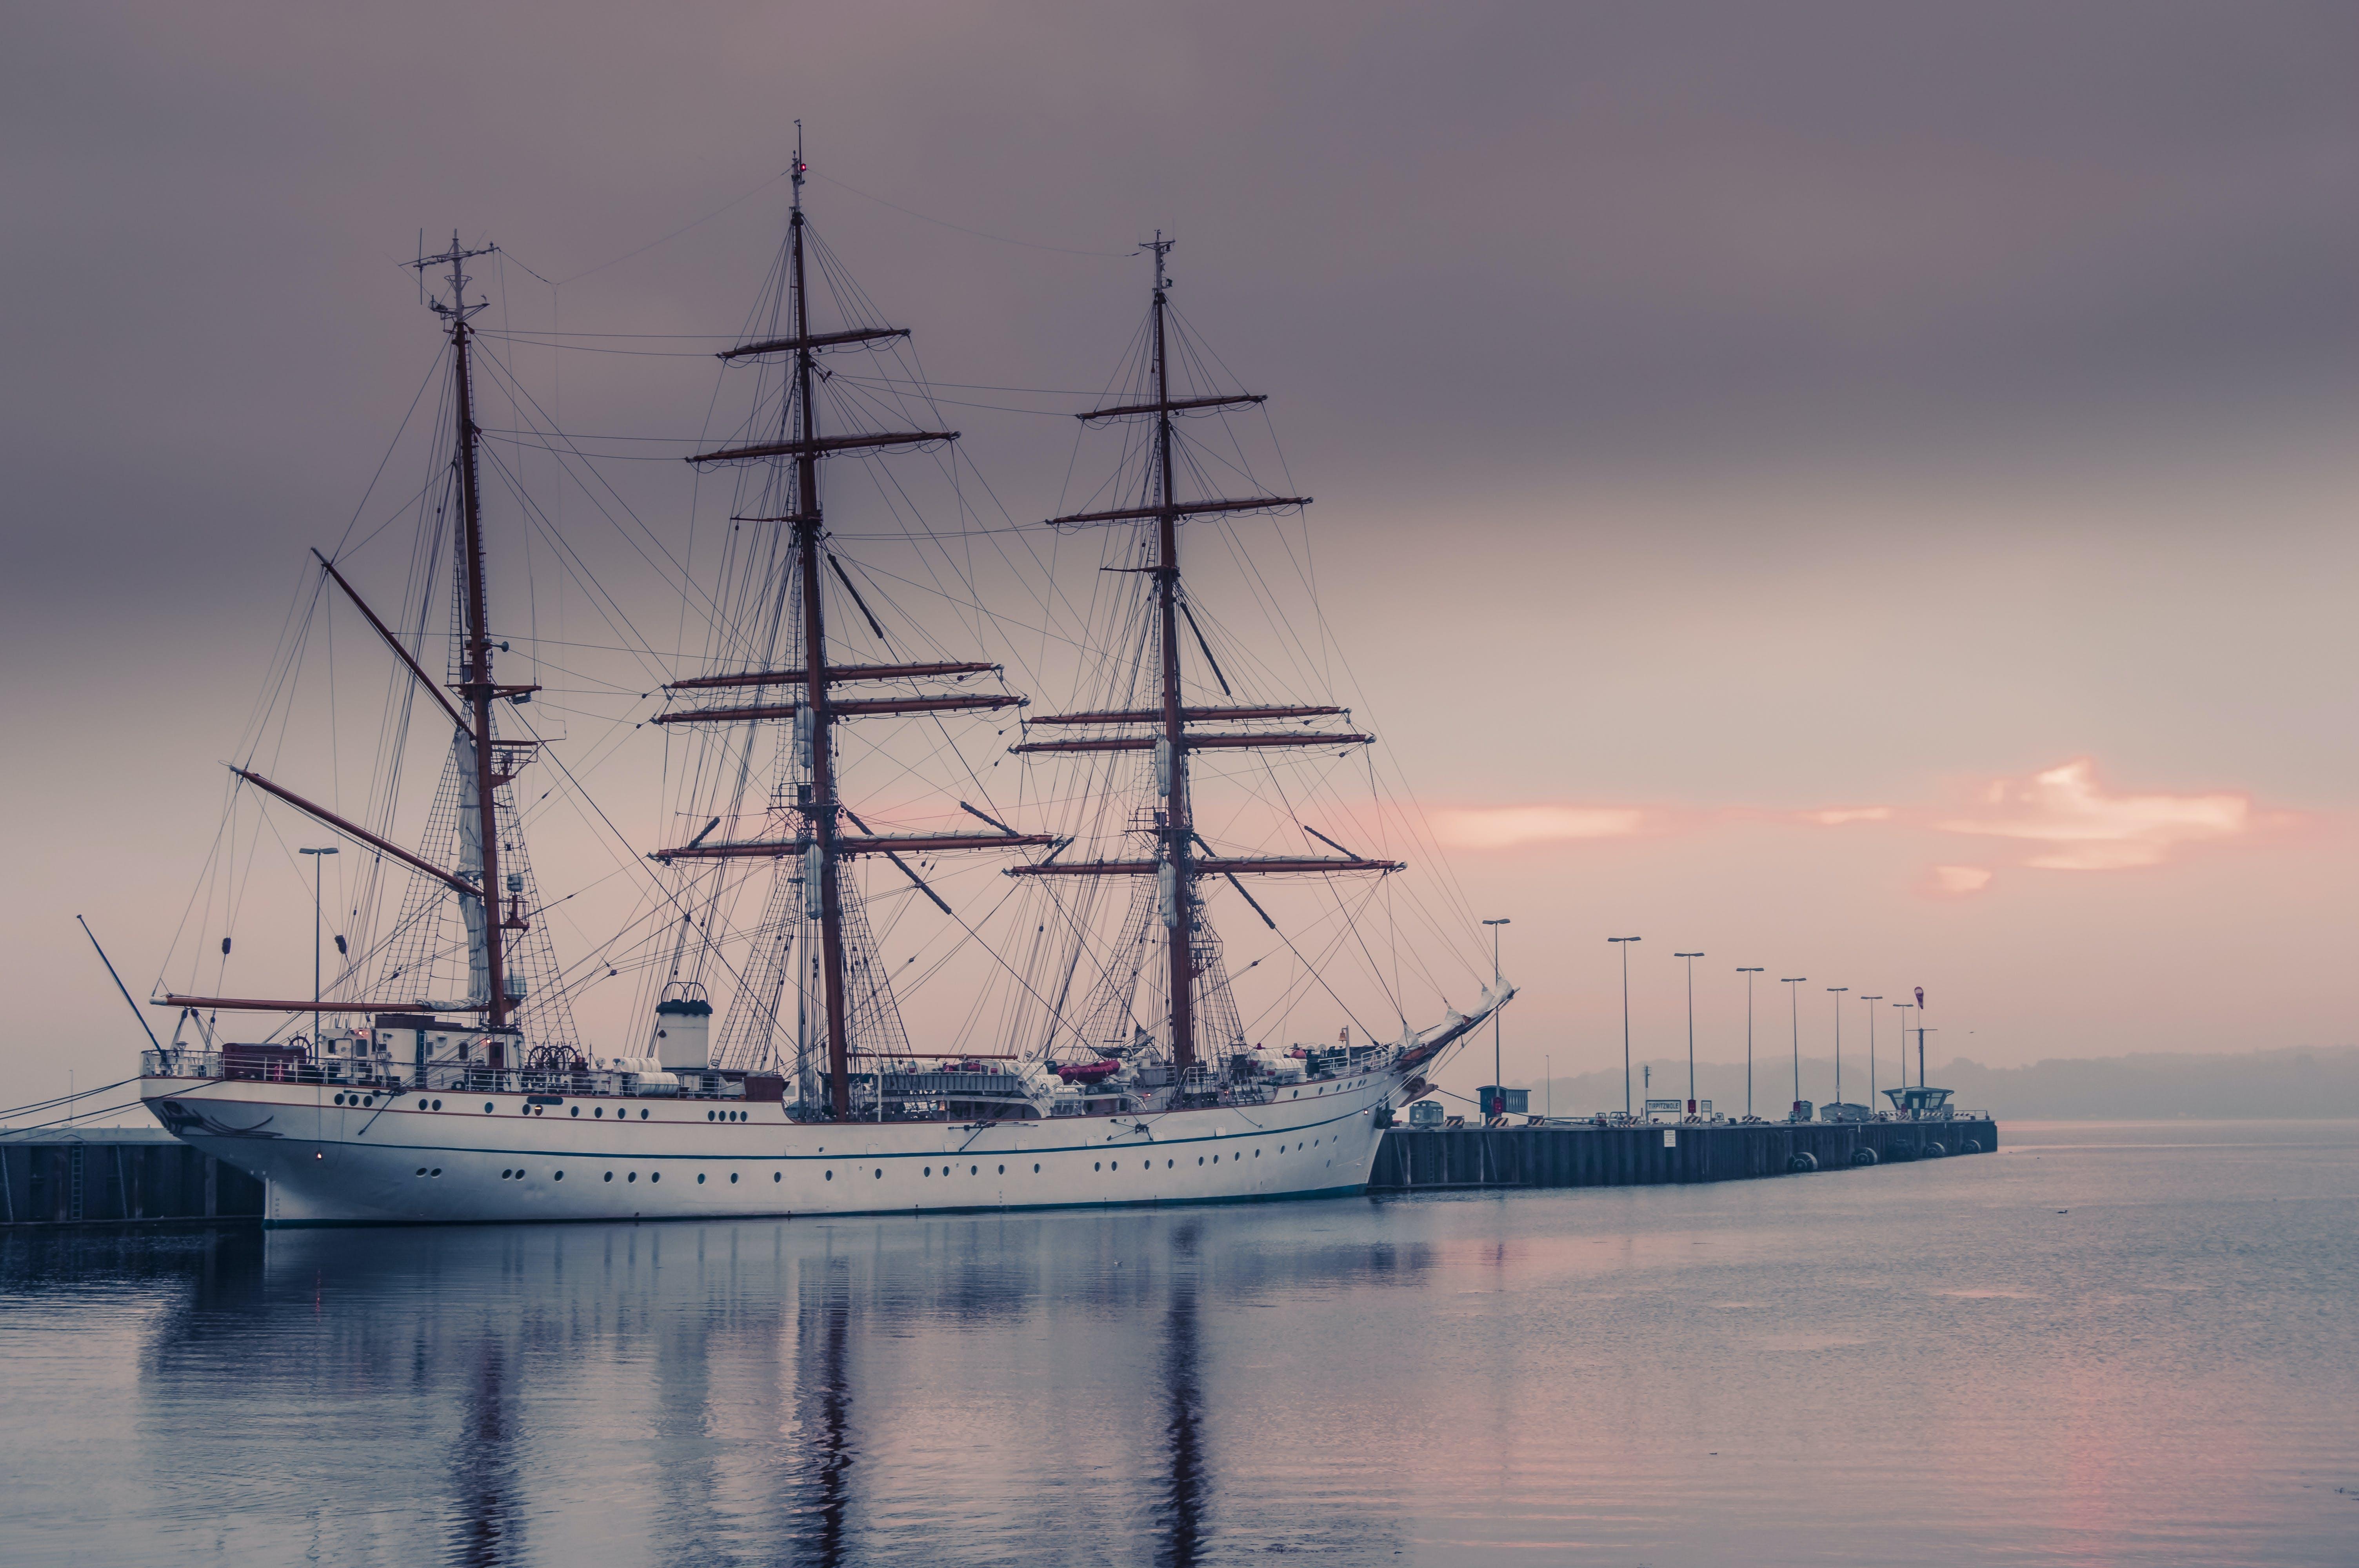 Free stock photo of sea, ship, misty